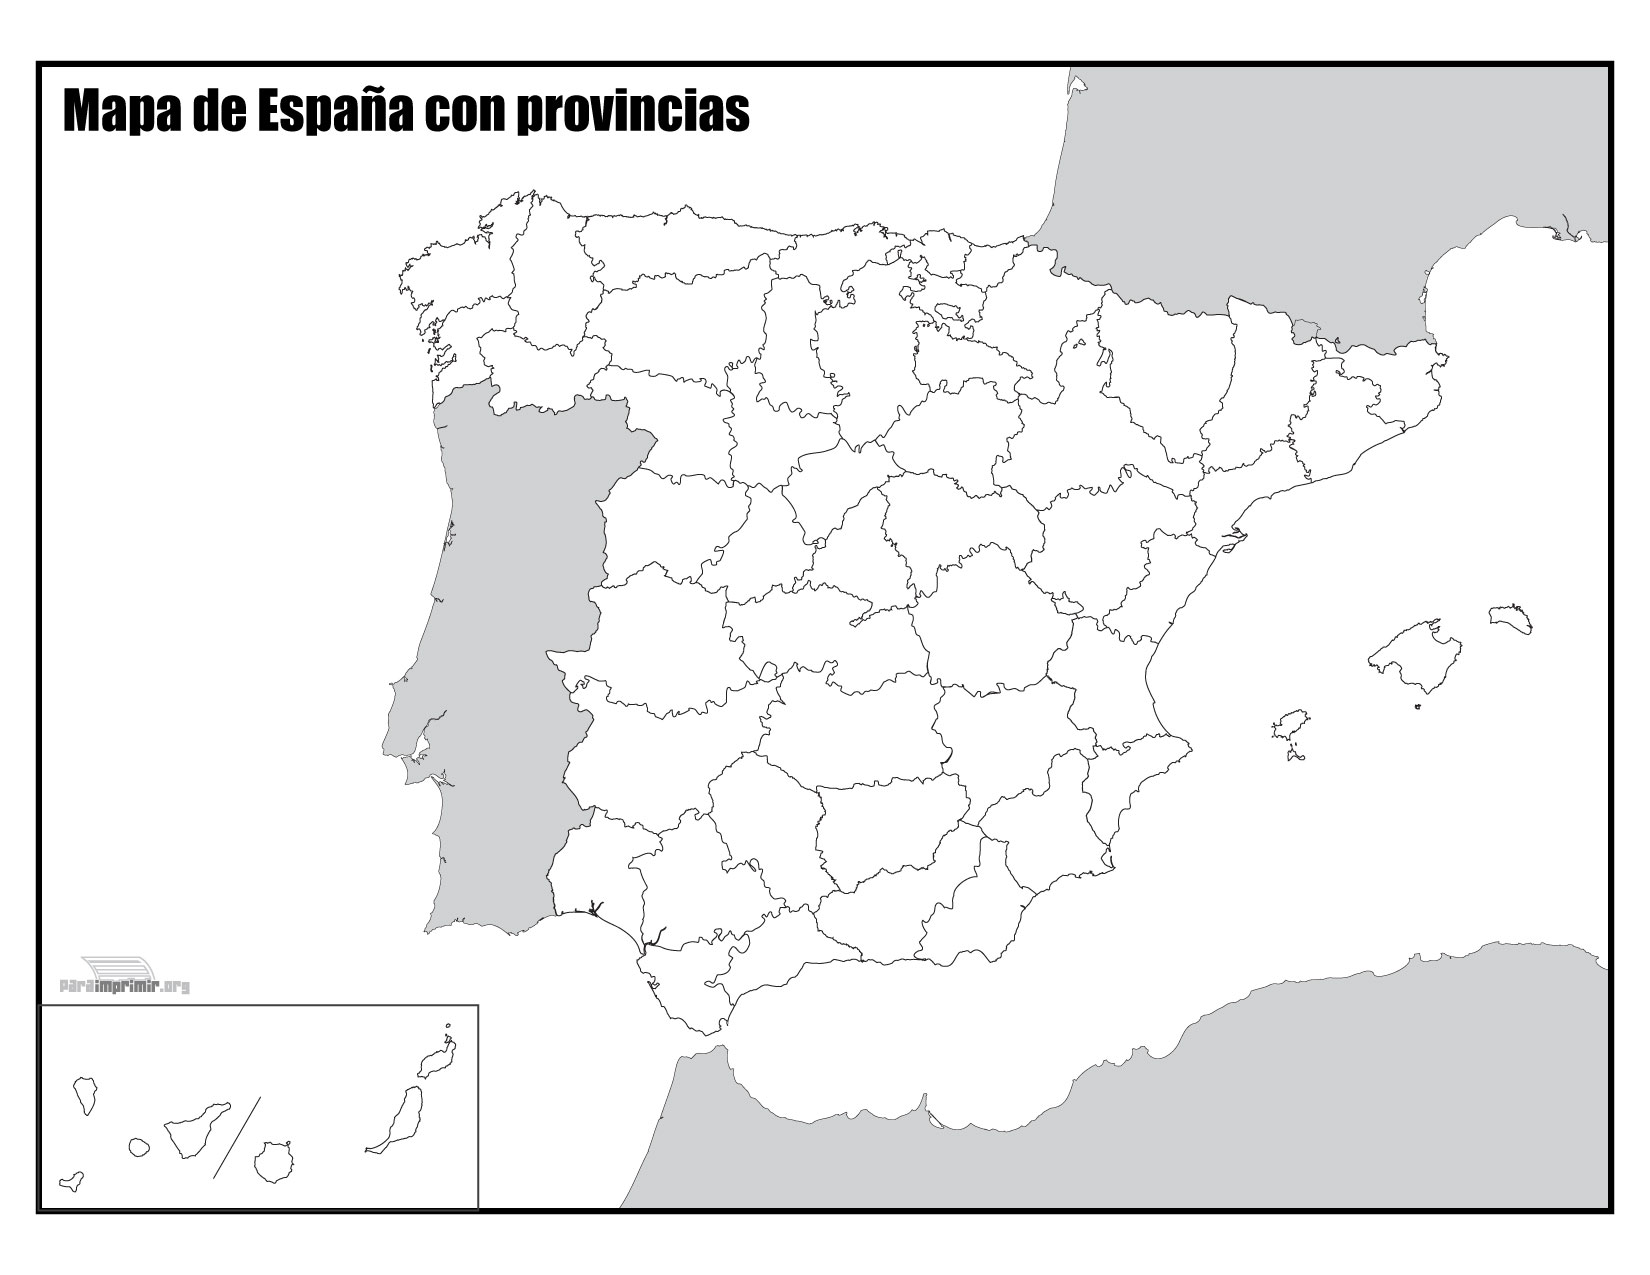 Mapa Mudo Comunidades Autonomas España Para Imprimir.Mapa De Espana Con Provincias Sin Nombres Para Imprimir